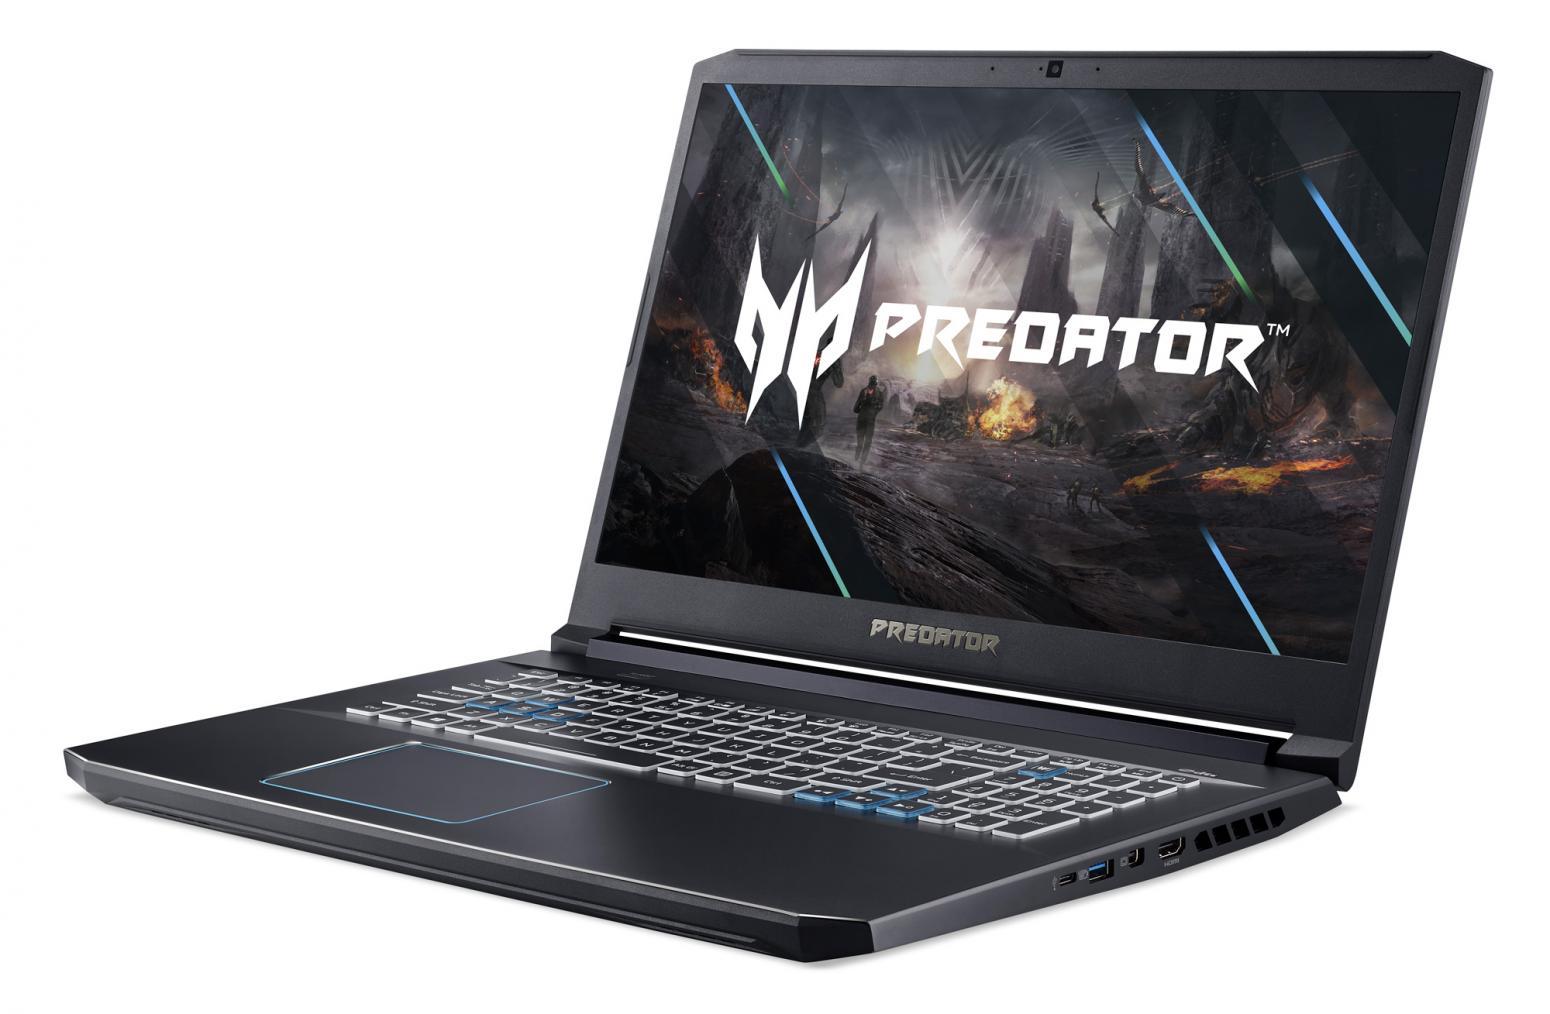 Ordinateur portable Acer Predator Helios 300 PH317-54-7677 - RTX 2070 Max-Q, 144Hz - photo 3